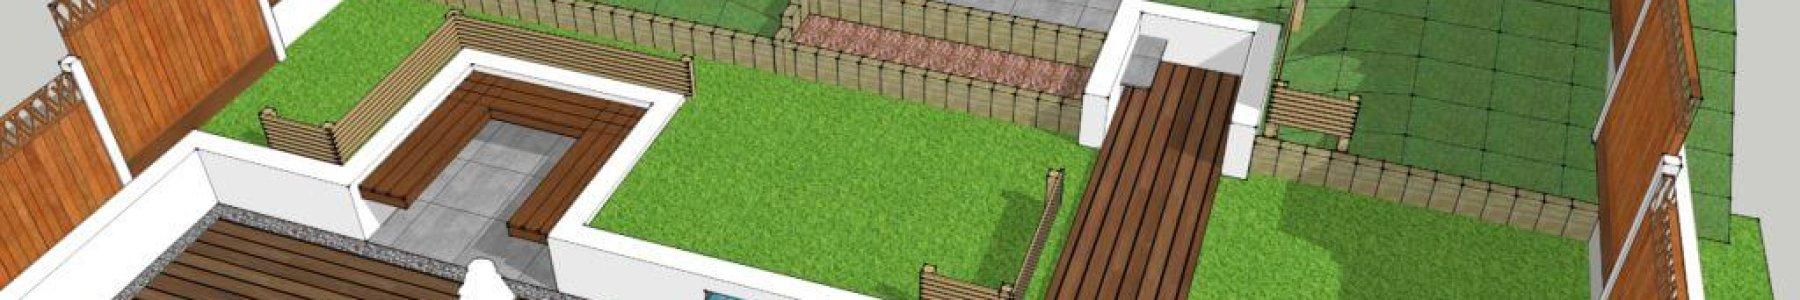 Split Level Garden